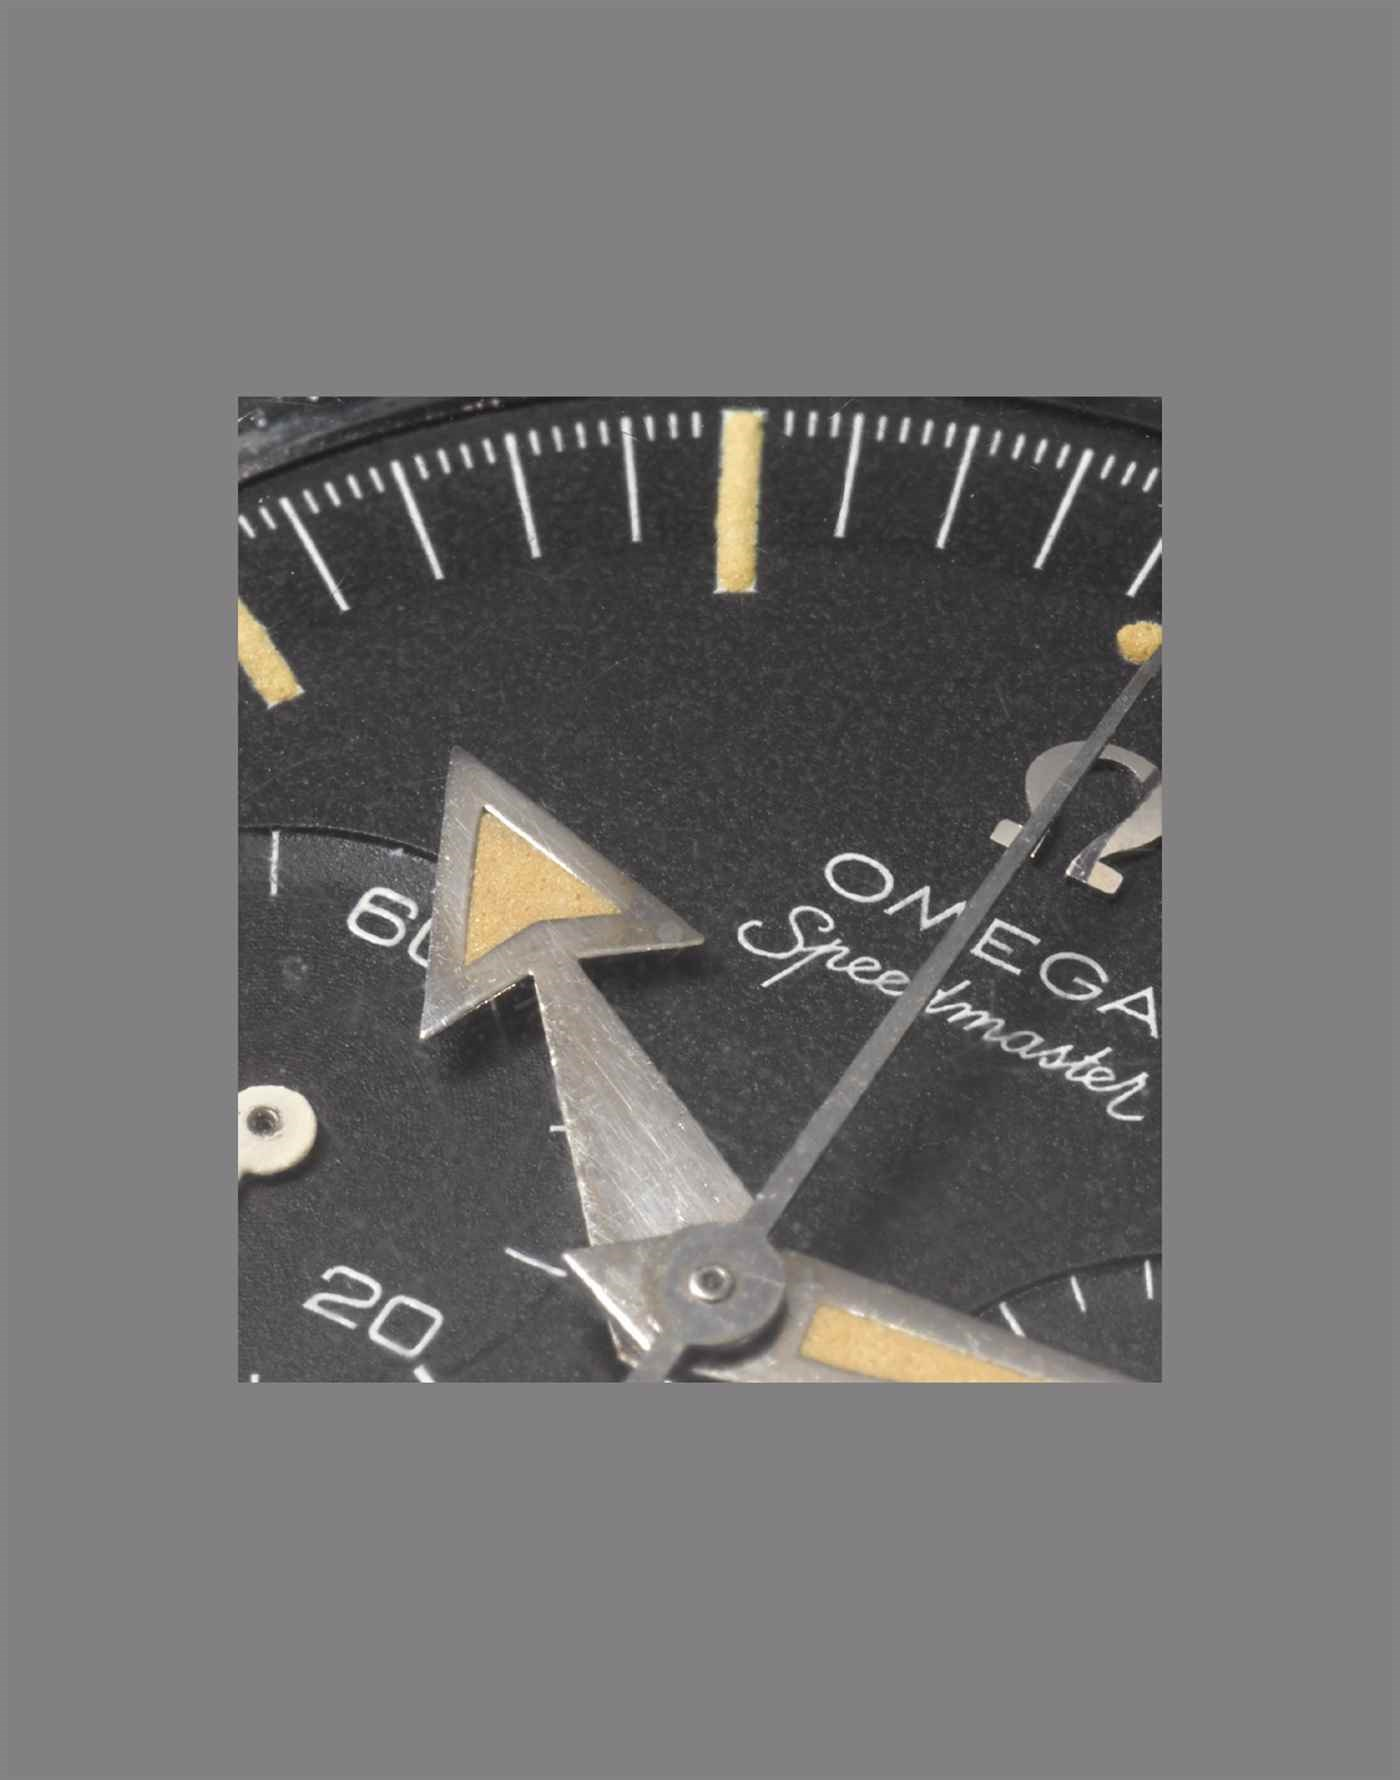 Omega Speedmaster 50 auction at Christies